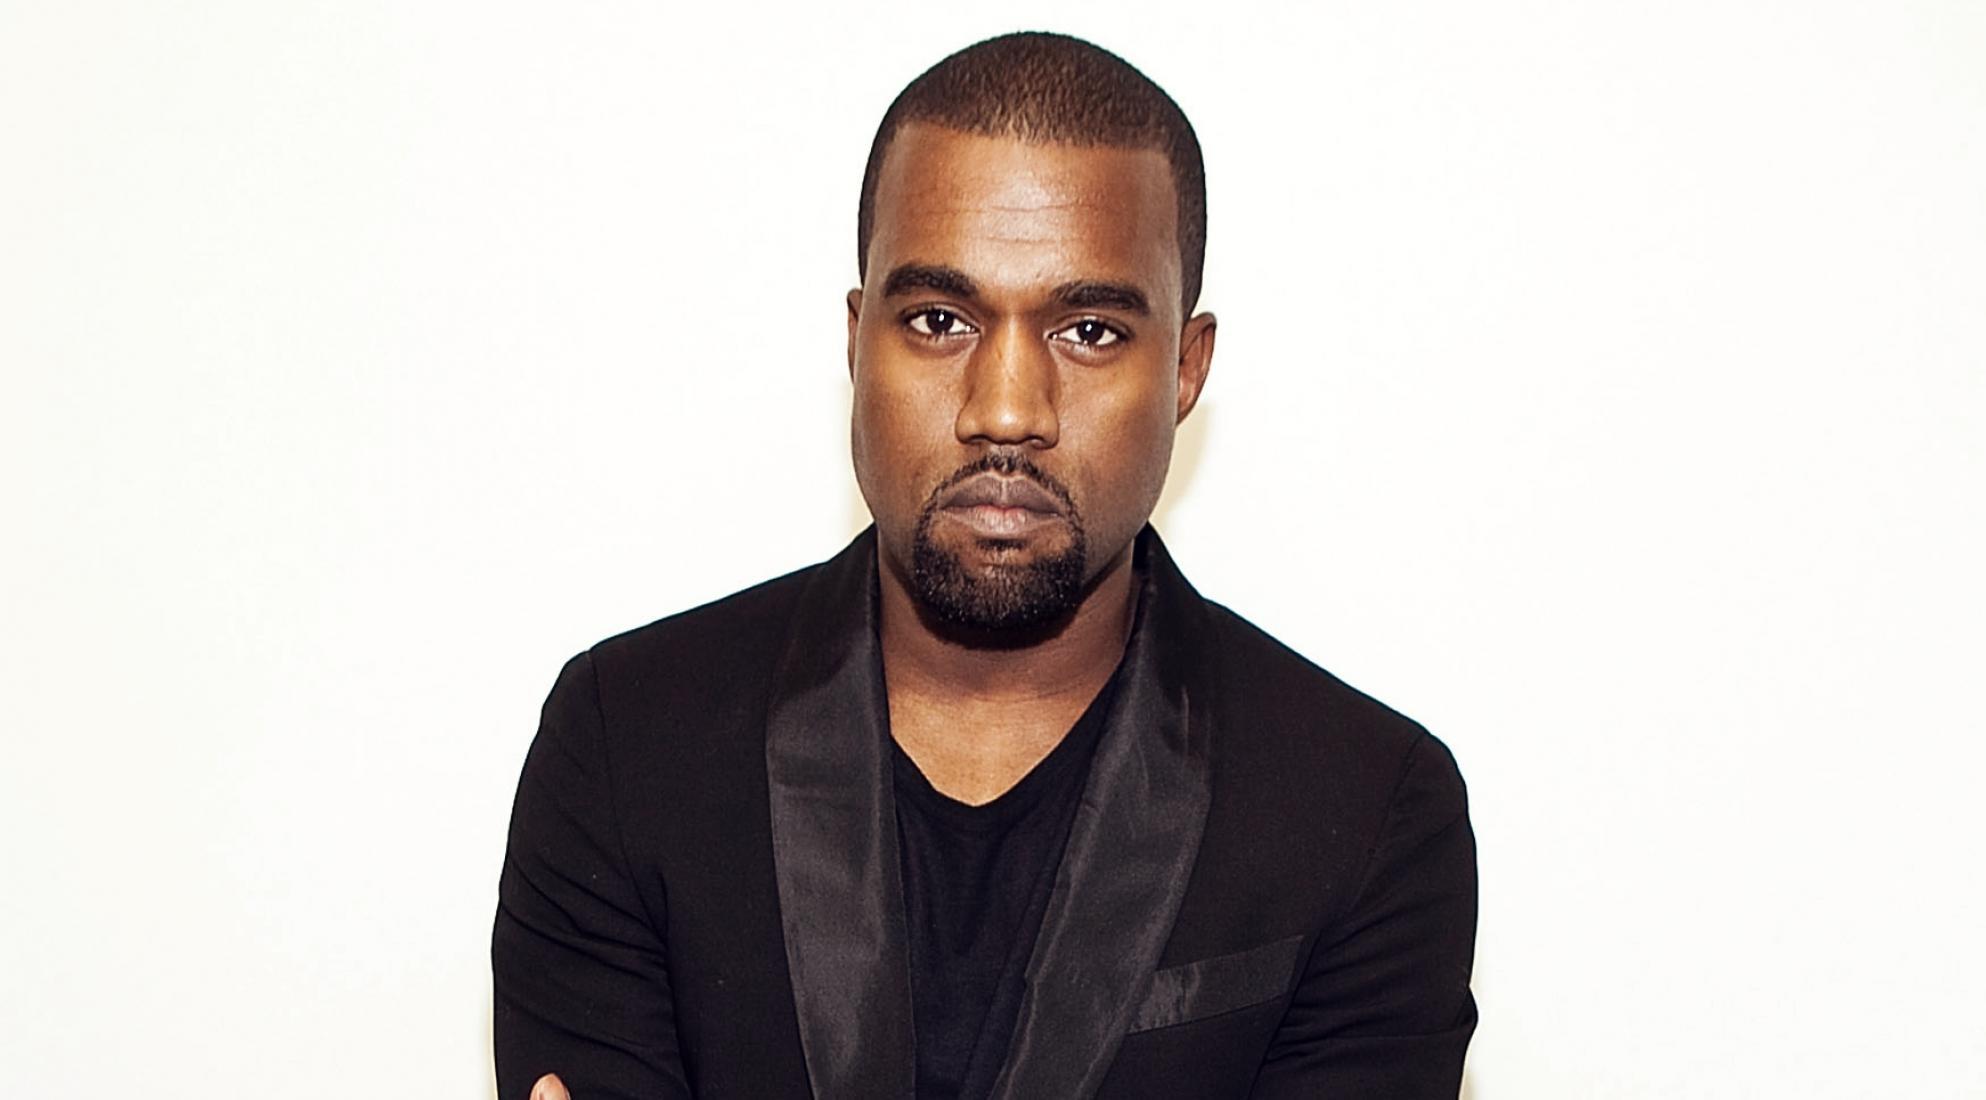 Kanye West: Αυτό είναι το παραμυθένιο εξώφυλλο του νέου του άλμπουμ | tlife.gr